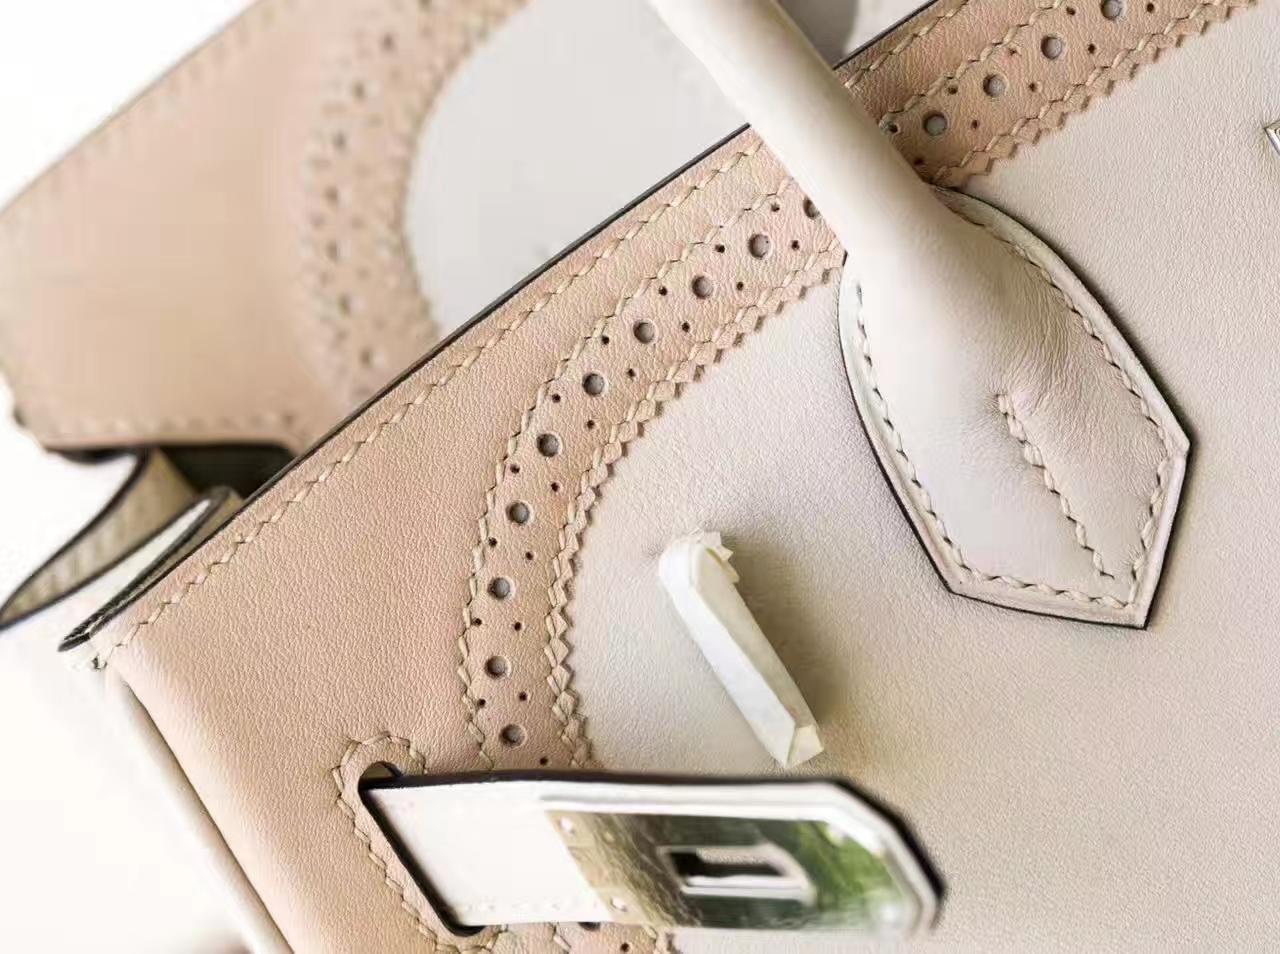 Hermes爱马仕珍珠灰拼斑鸠灰原厂Swift牛皮蕾丝铂金包Birkin30cm